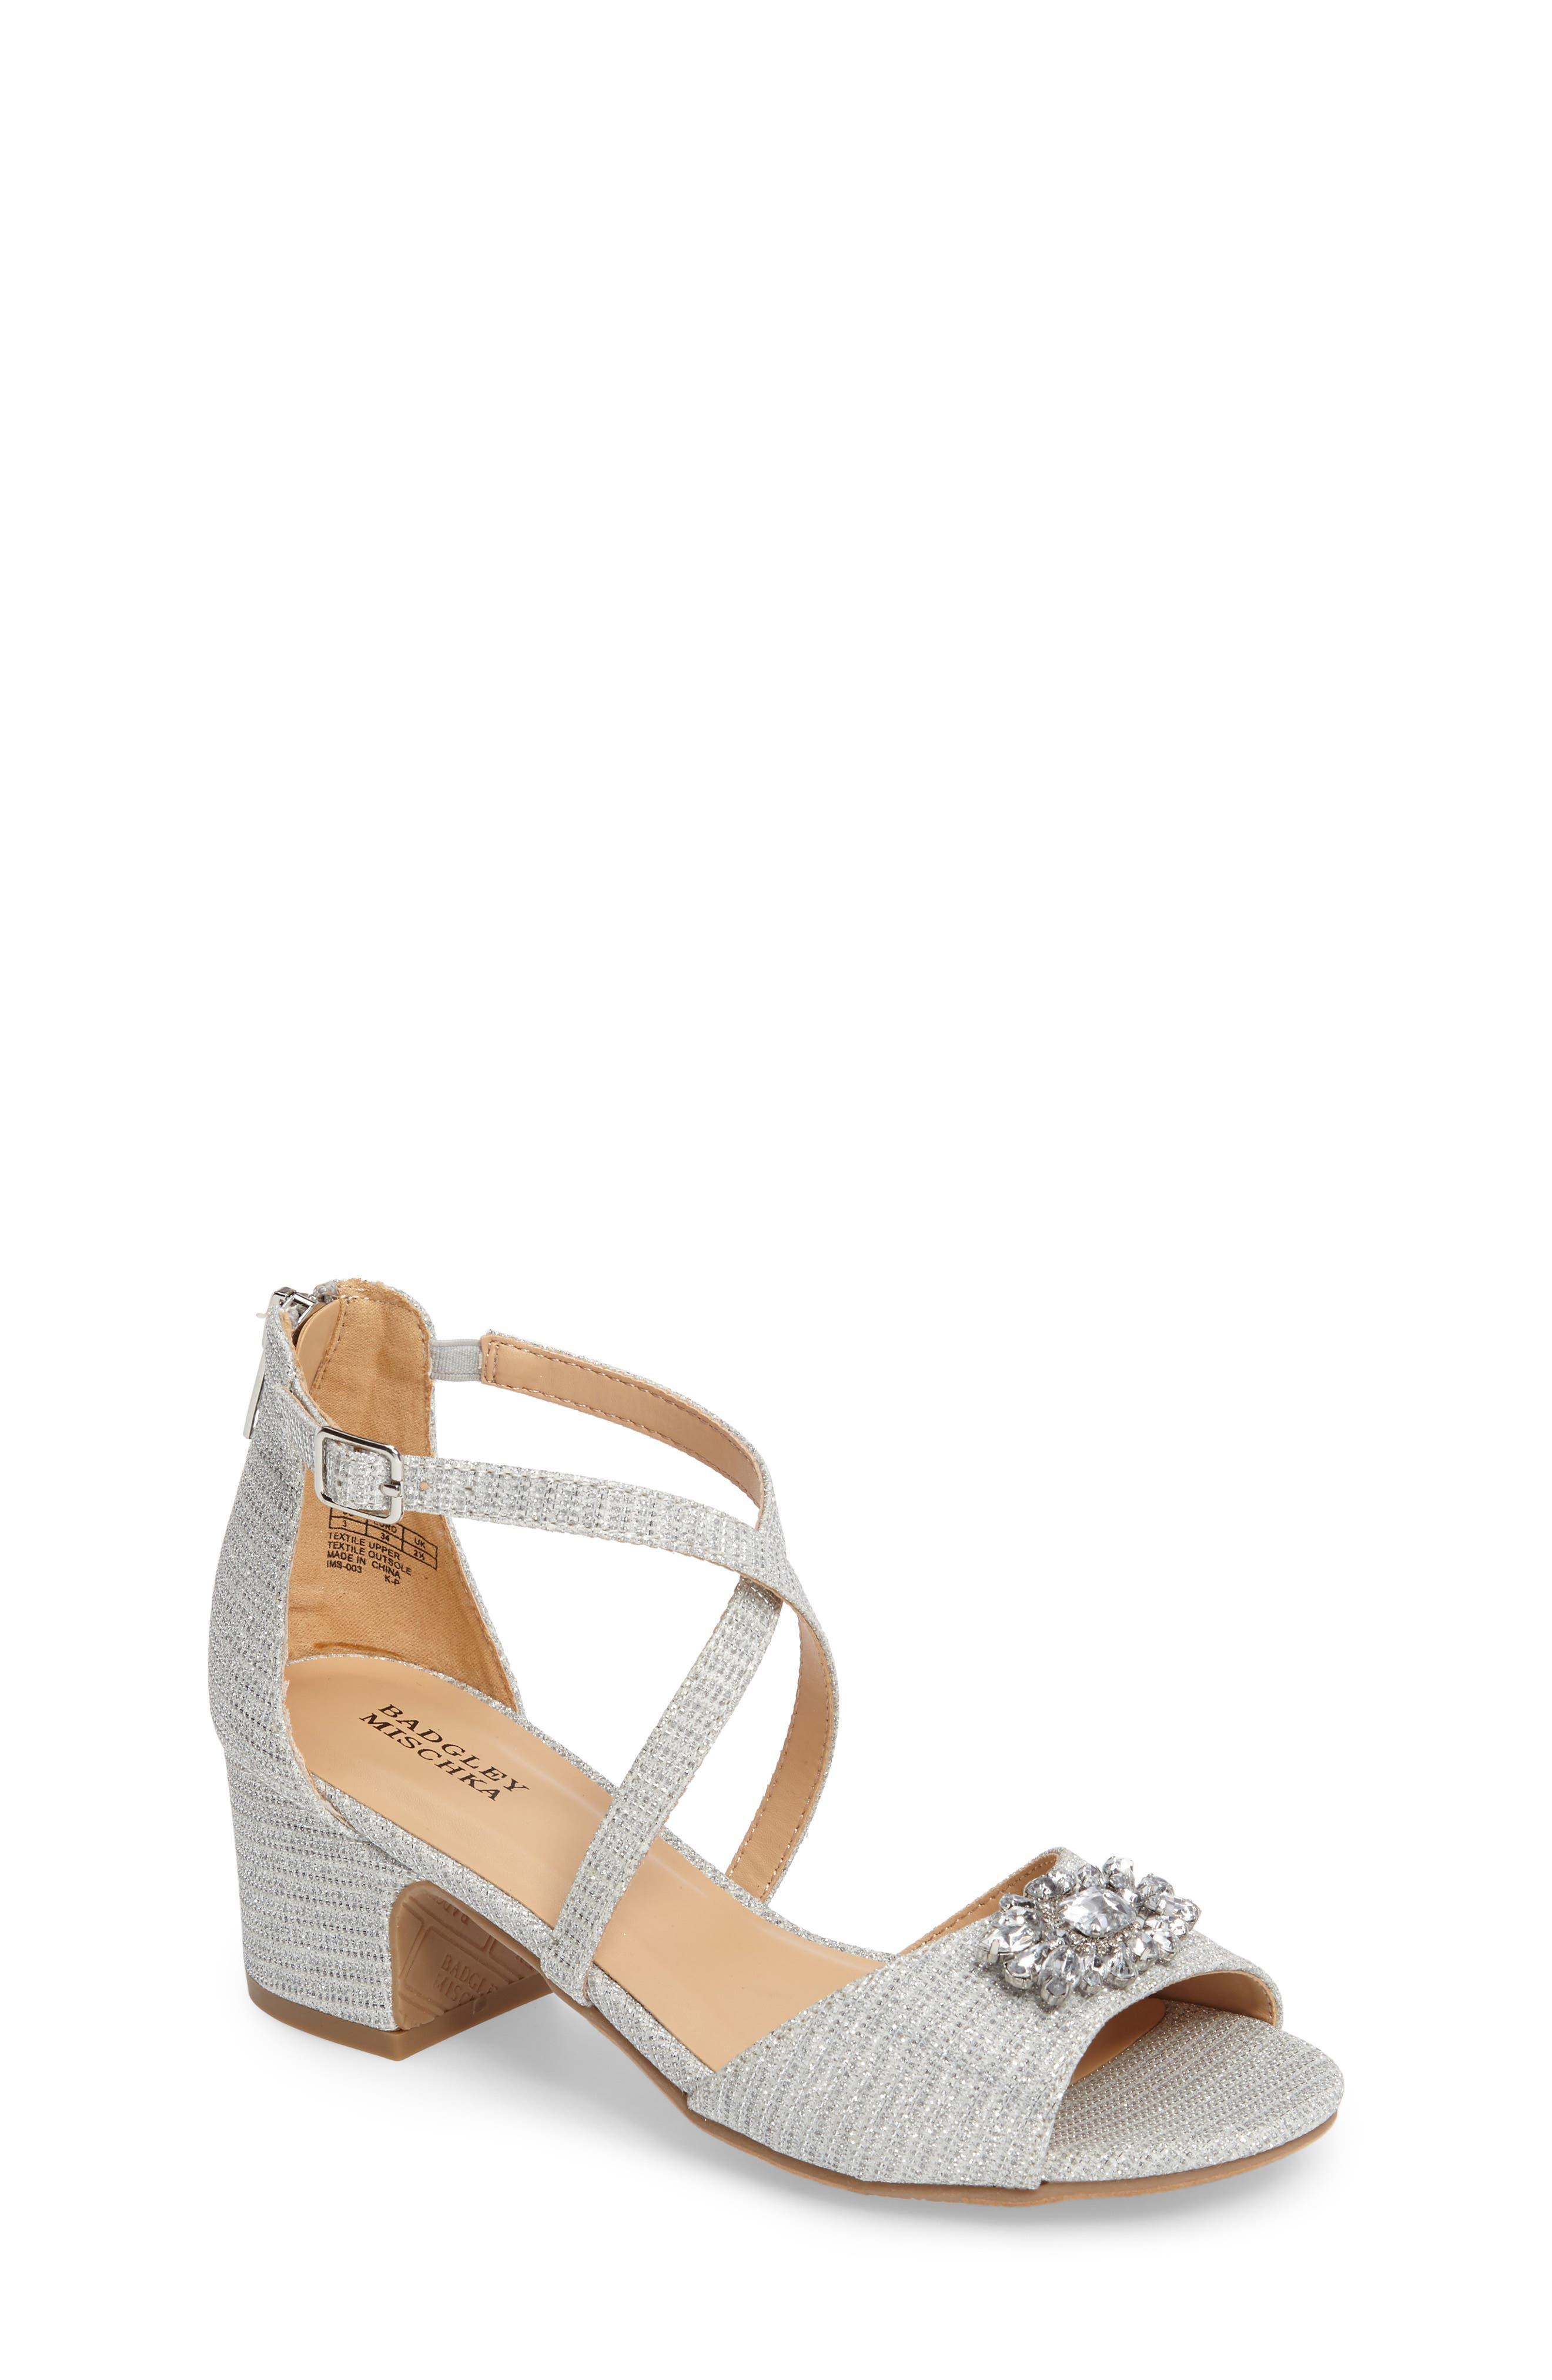 Toddler Girls Badgley Mischka Pernia Gems Sandal Size 12 M  Grey